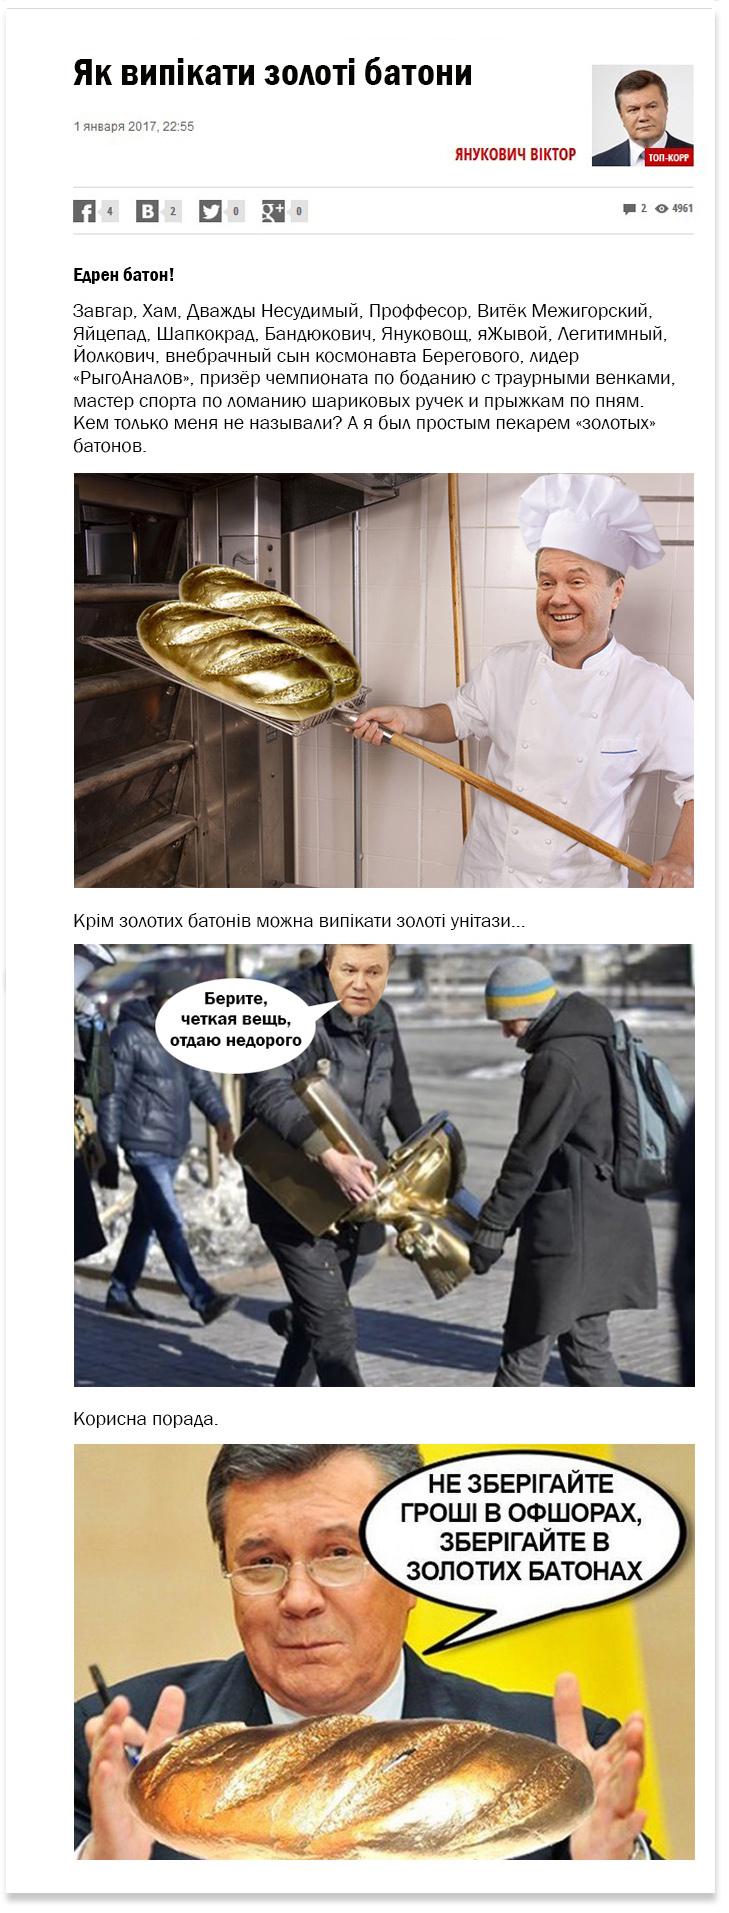 Як спекти золотий батон: блог Януковича у ФОТОЖАБАХ - фото 1